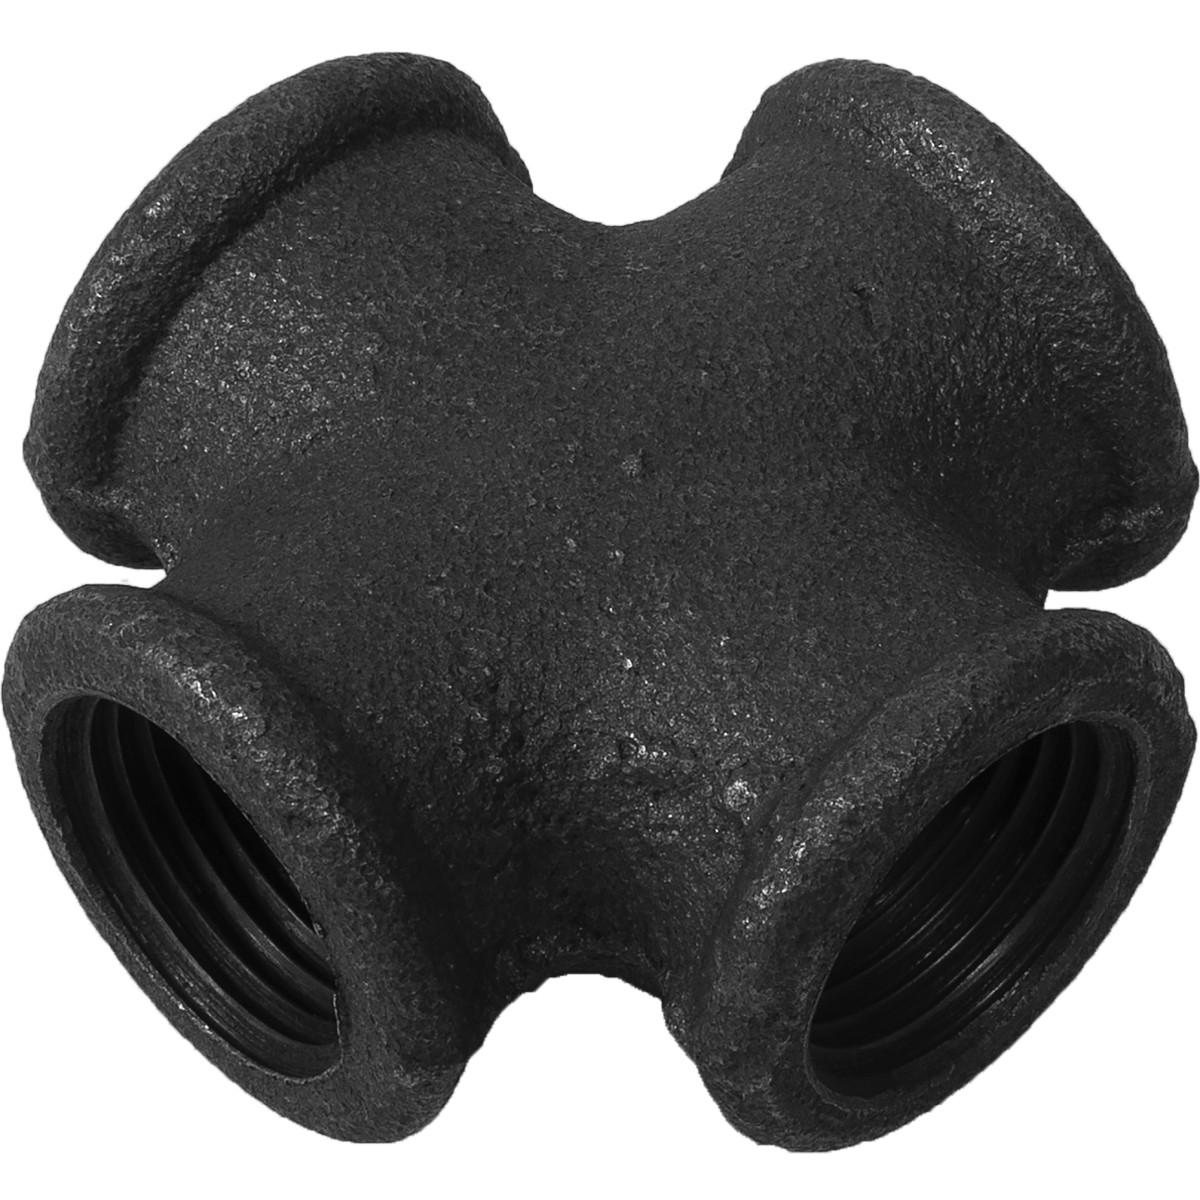 Крестовина внутренняя резьба 1/2 мм ковкий чугун цвет черный